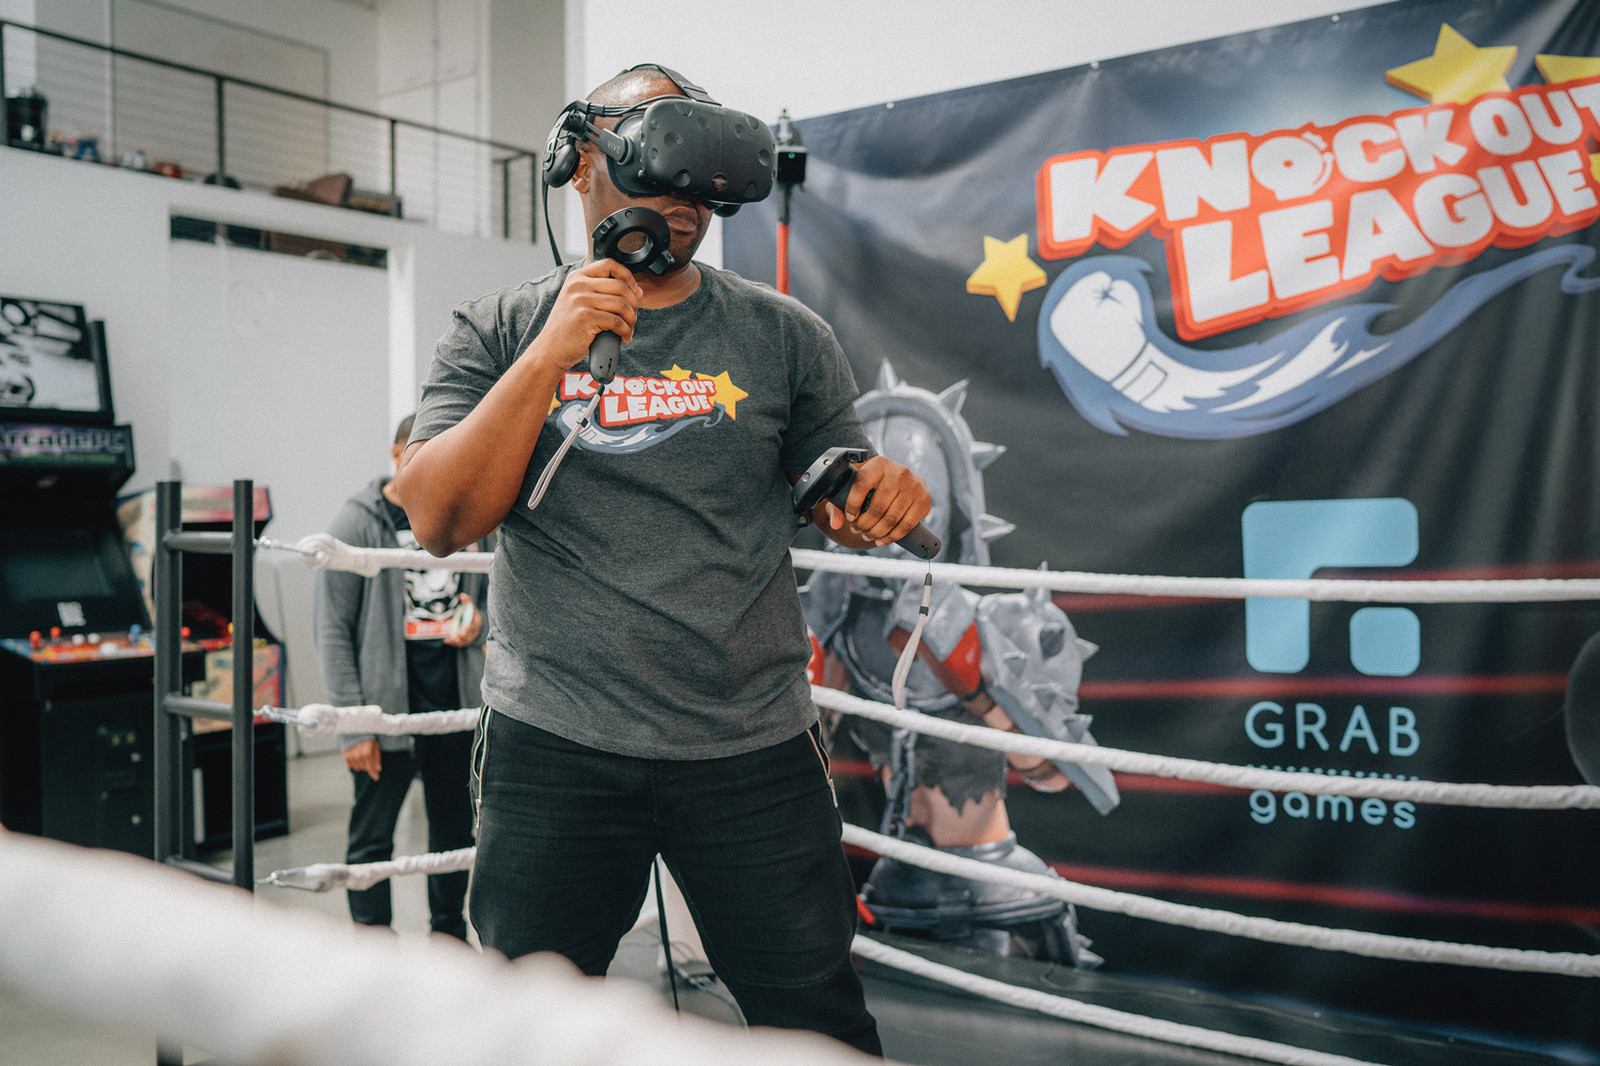 Harold Vancol Hans Vancol Grab Games VR AR Virtual Reality Augmented Reality Air Jordan 9 11 Bred DB Nike Sneaker Bots Gaming Video Games Technology Doernbecher Knockout League YEEZY Boxing